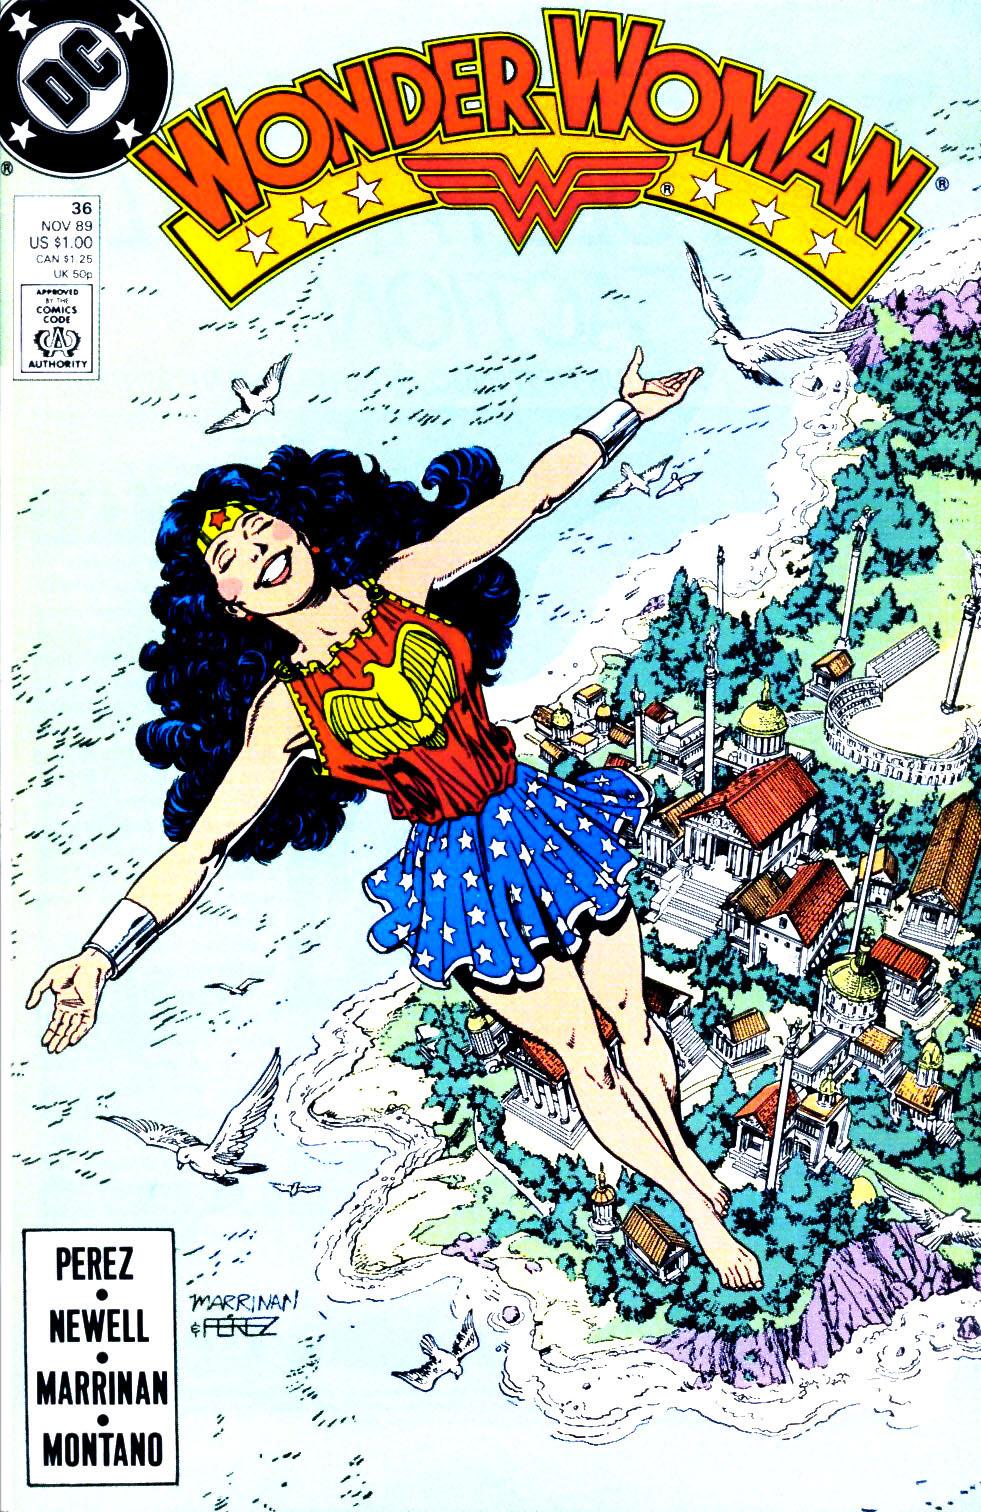 Read online Wonder Woman (1987) comic -  Issue #36 - 1